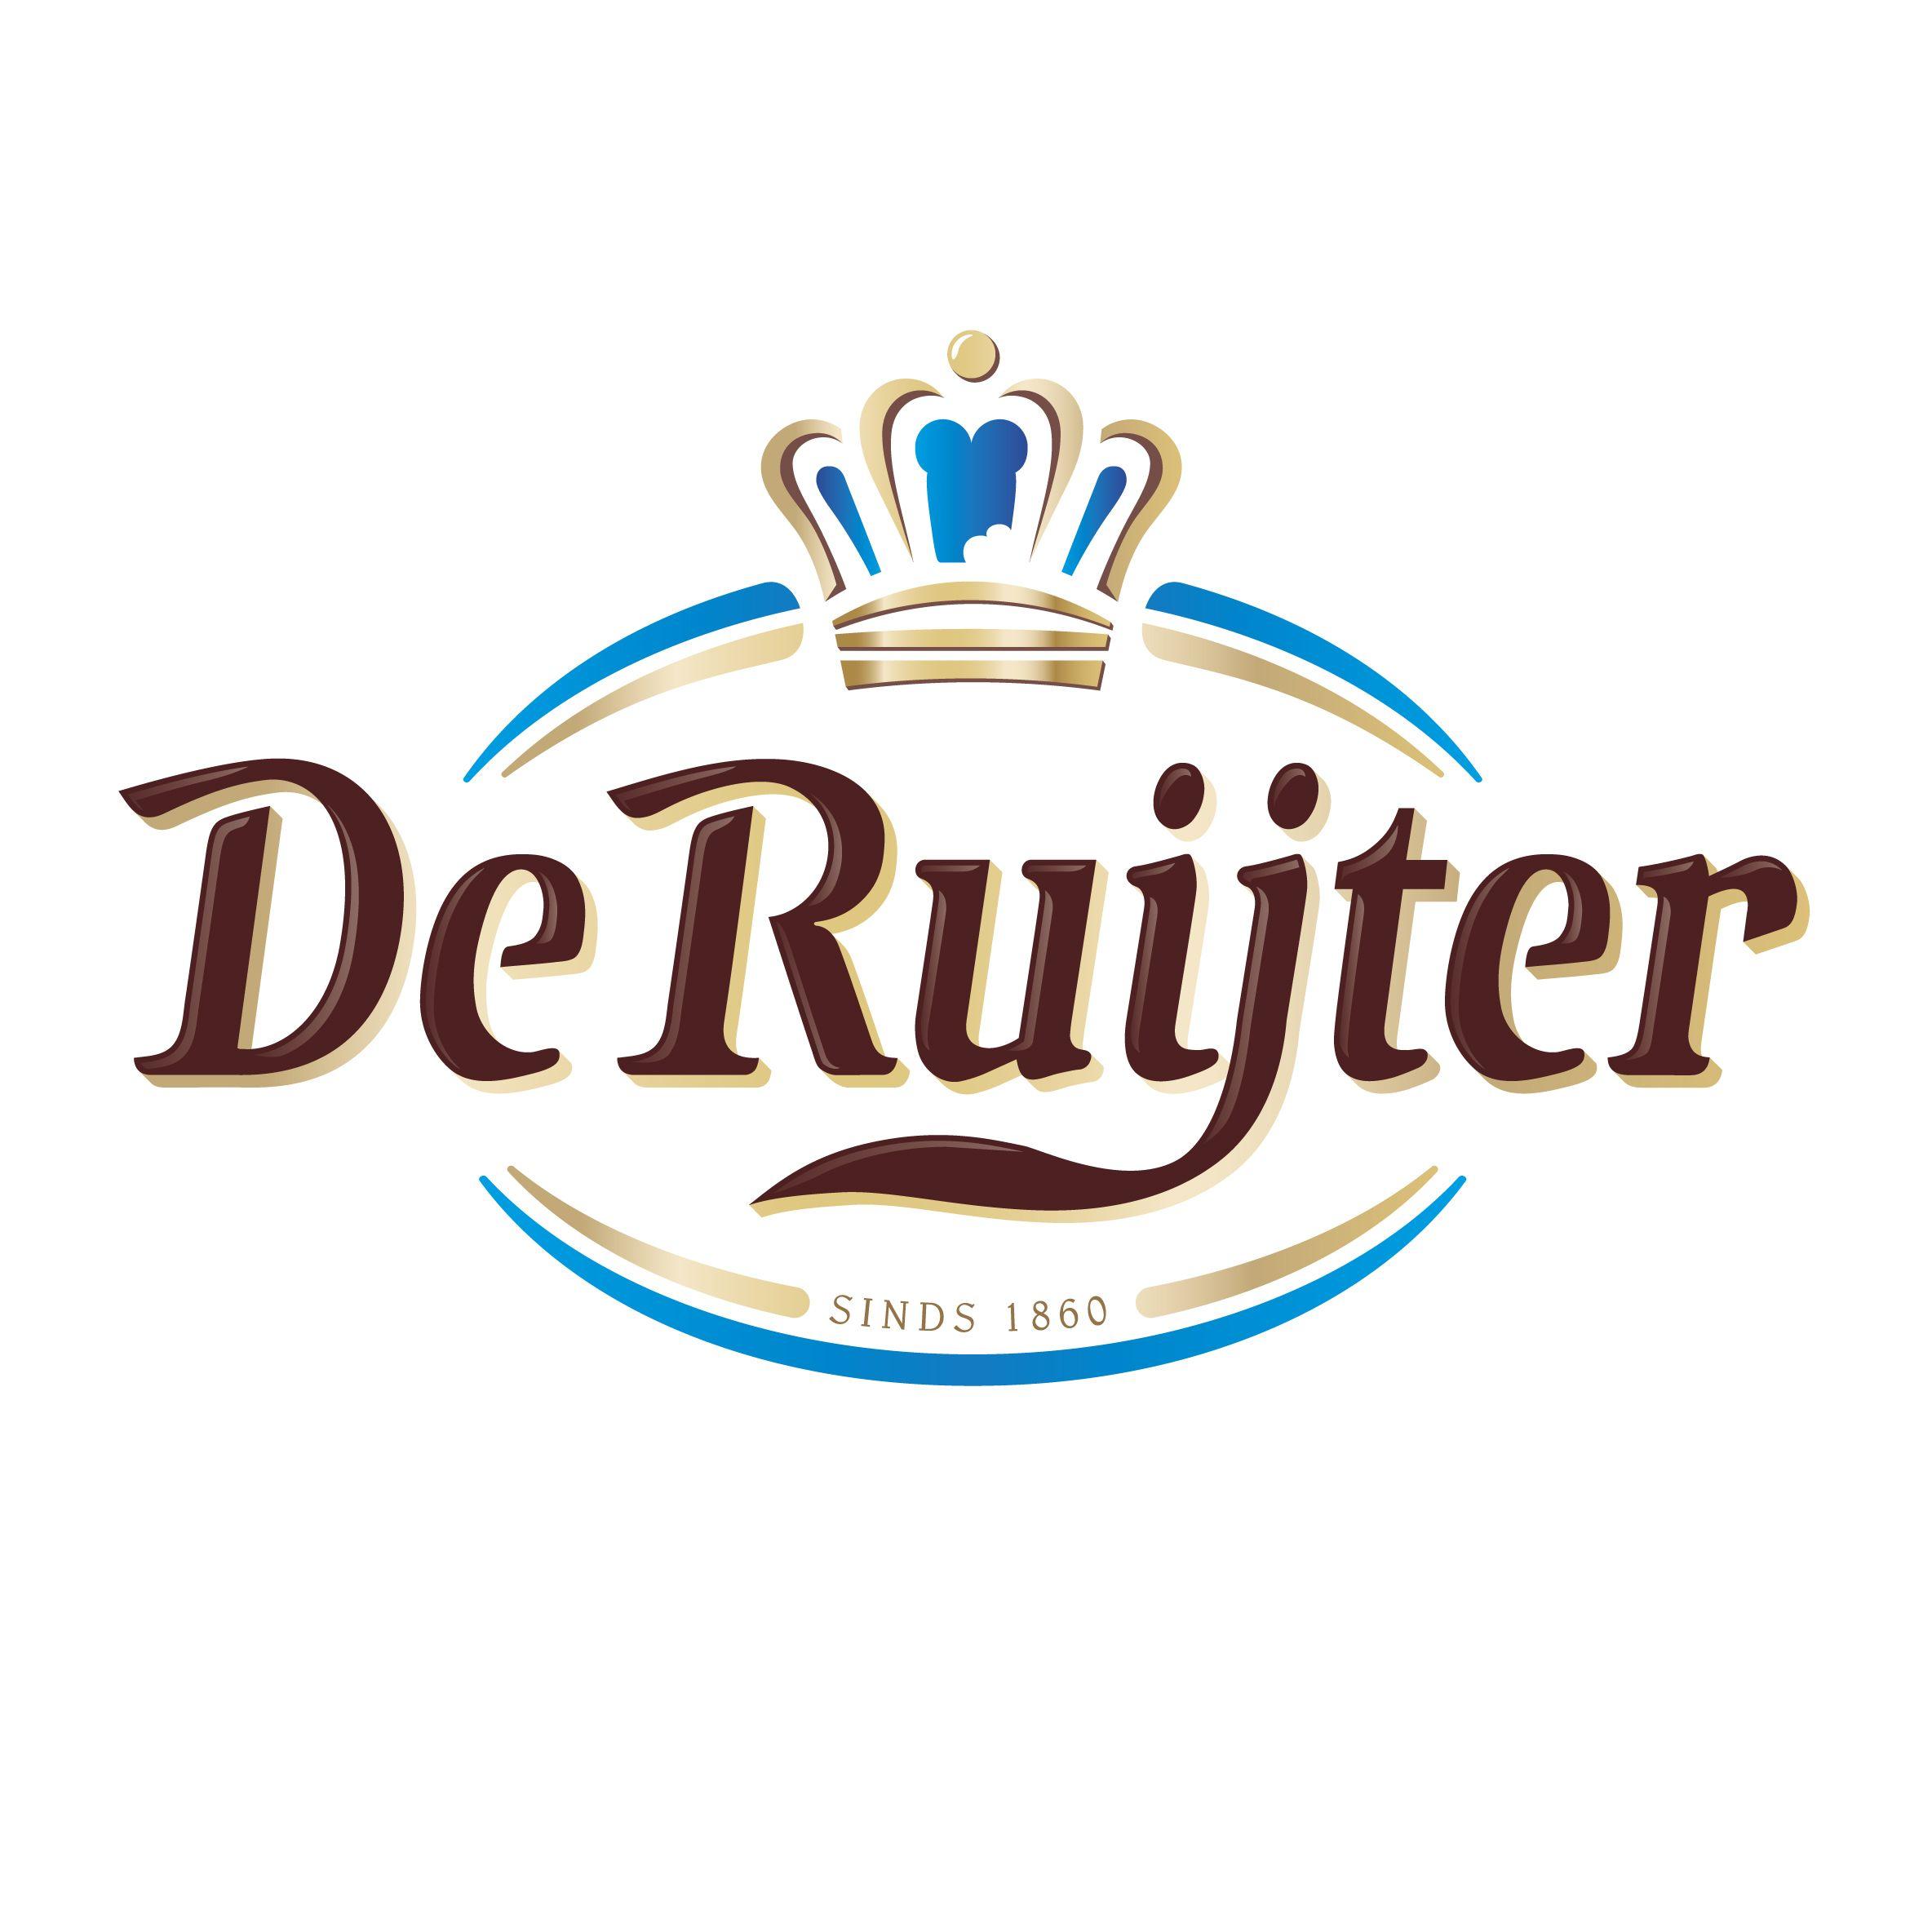 De Ruijter Logo design Sample made by LogoPeople Australia